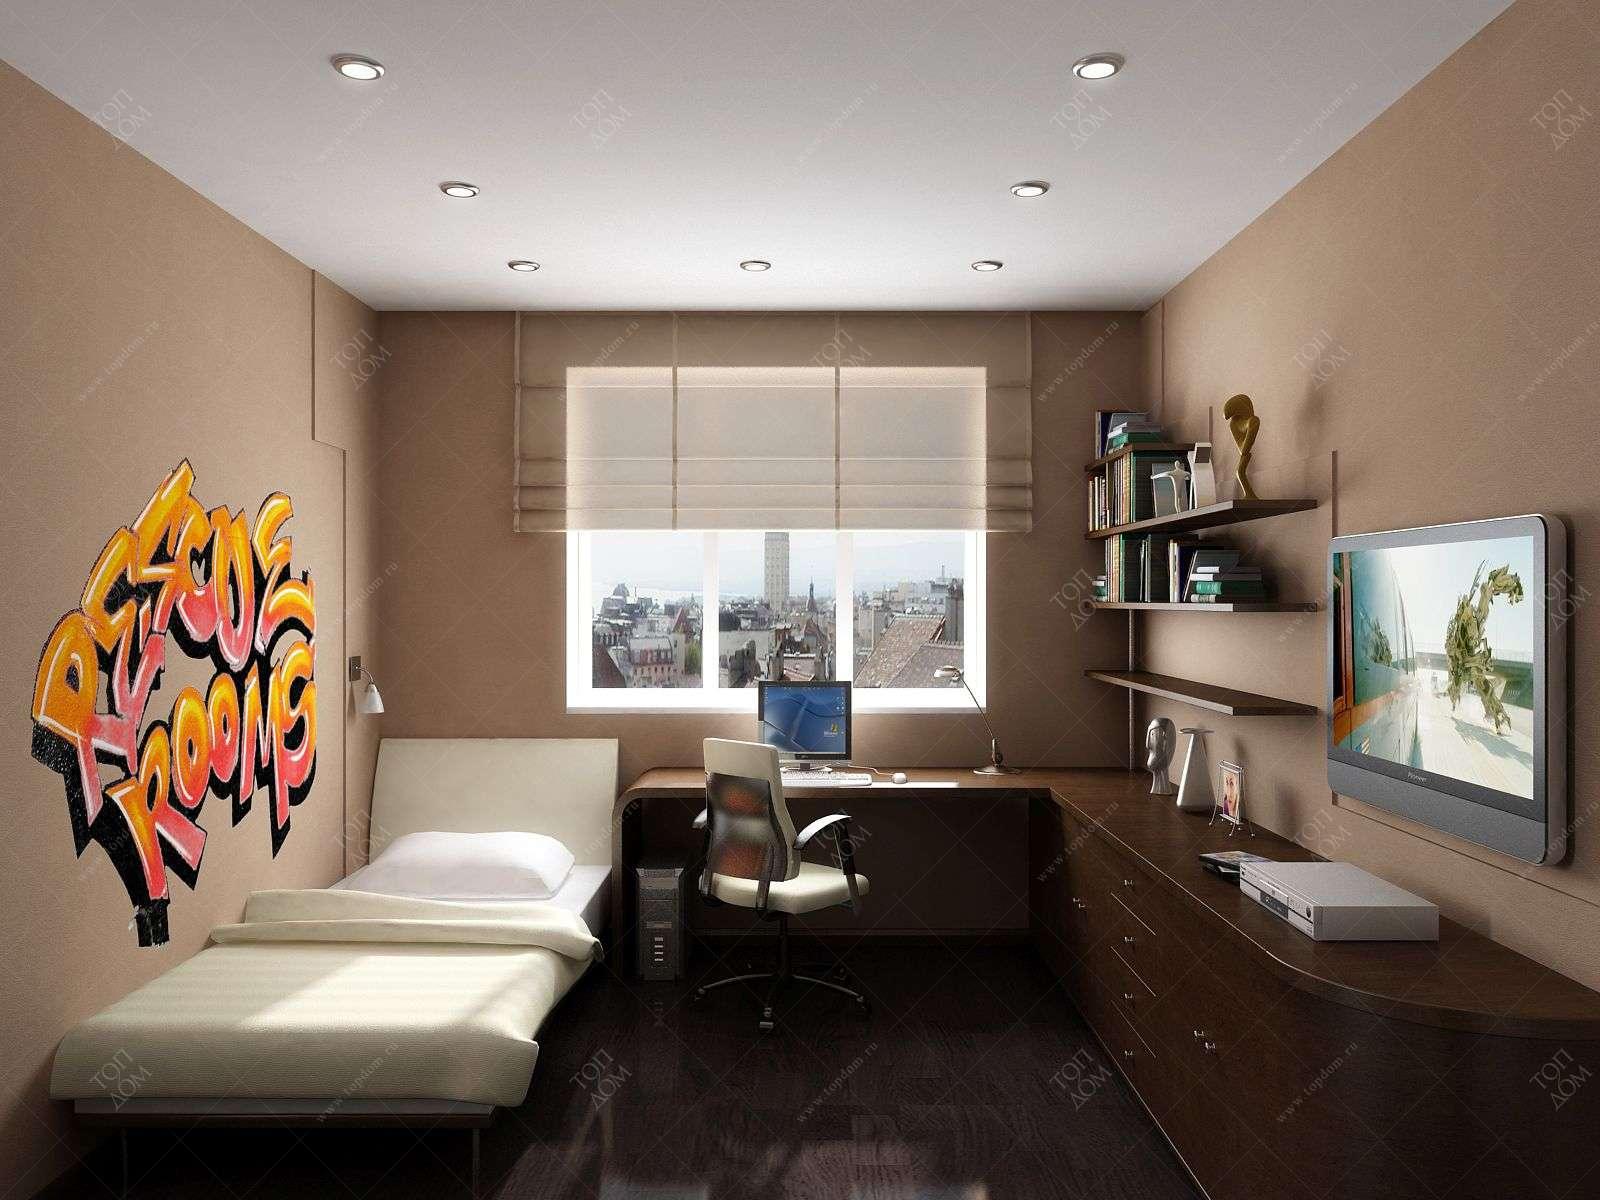 И др дизайн квартиры 22 дизайн проект